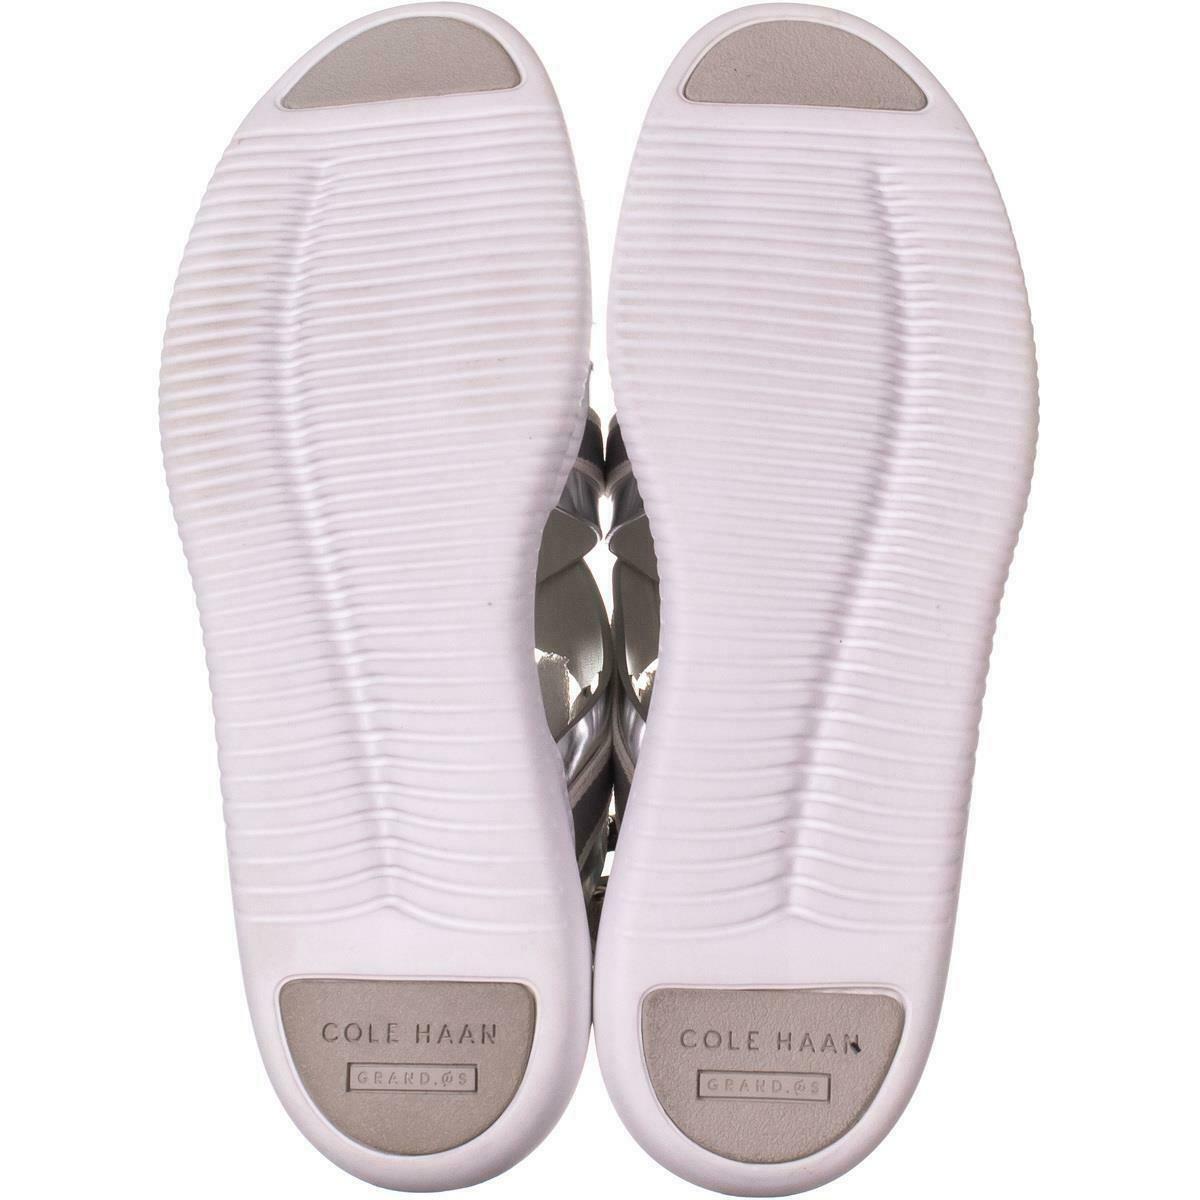 Cole Haan 2 Zerogrand Criss Cross Sandals 703, Argento, 10.5 US image 6